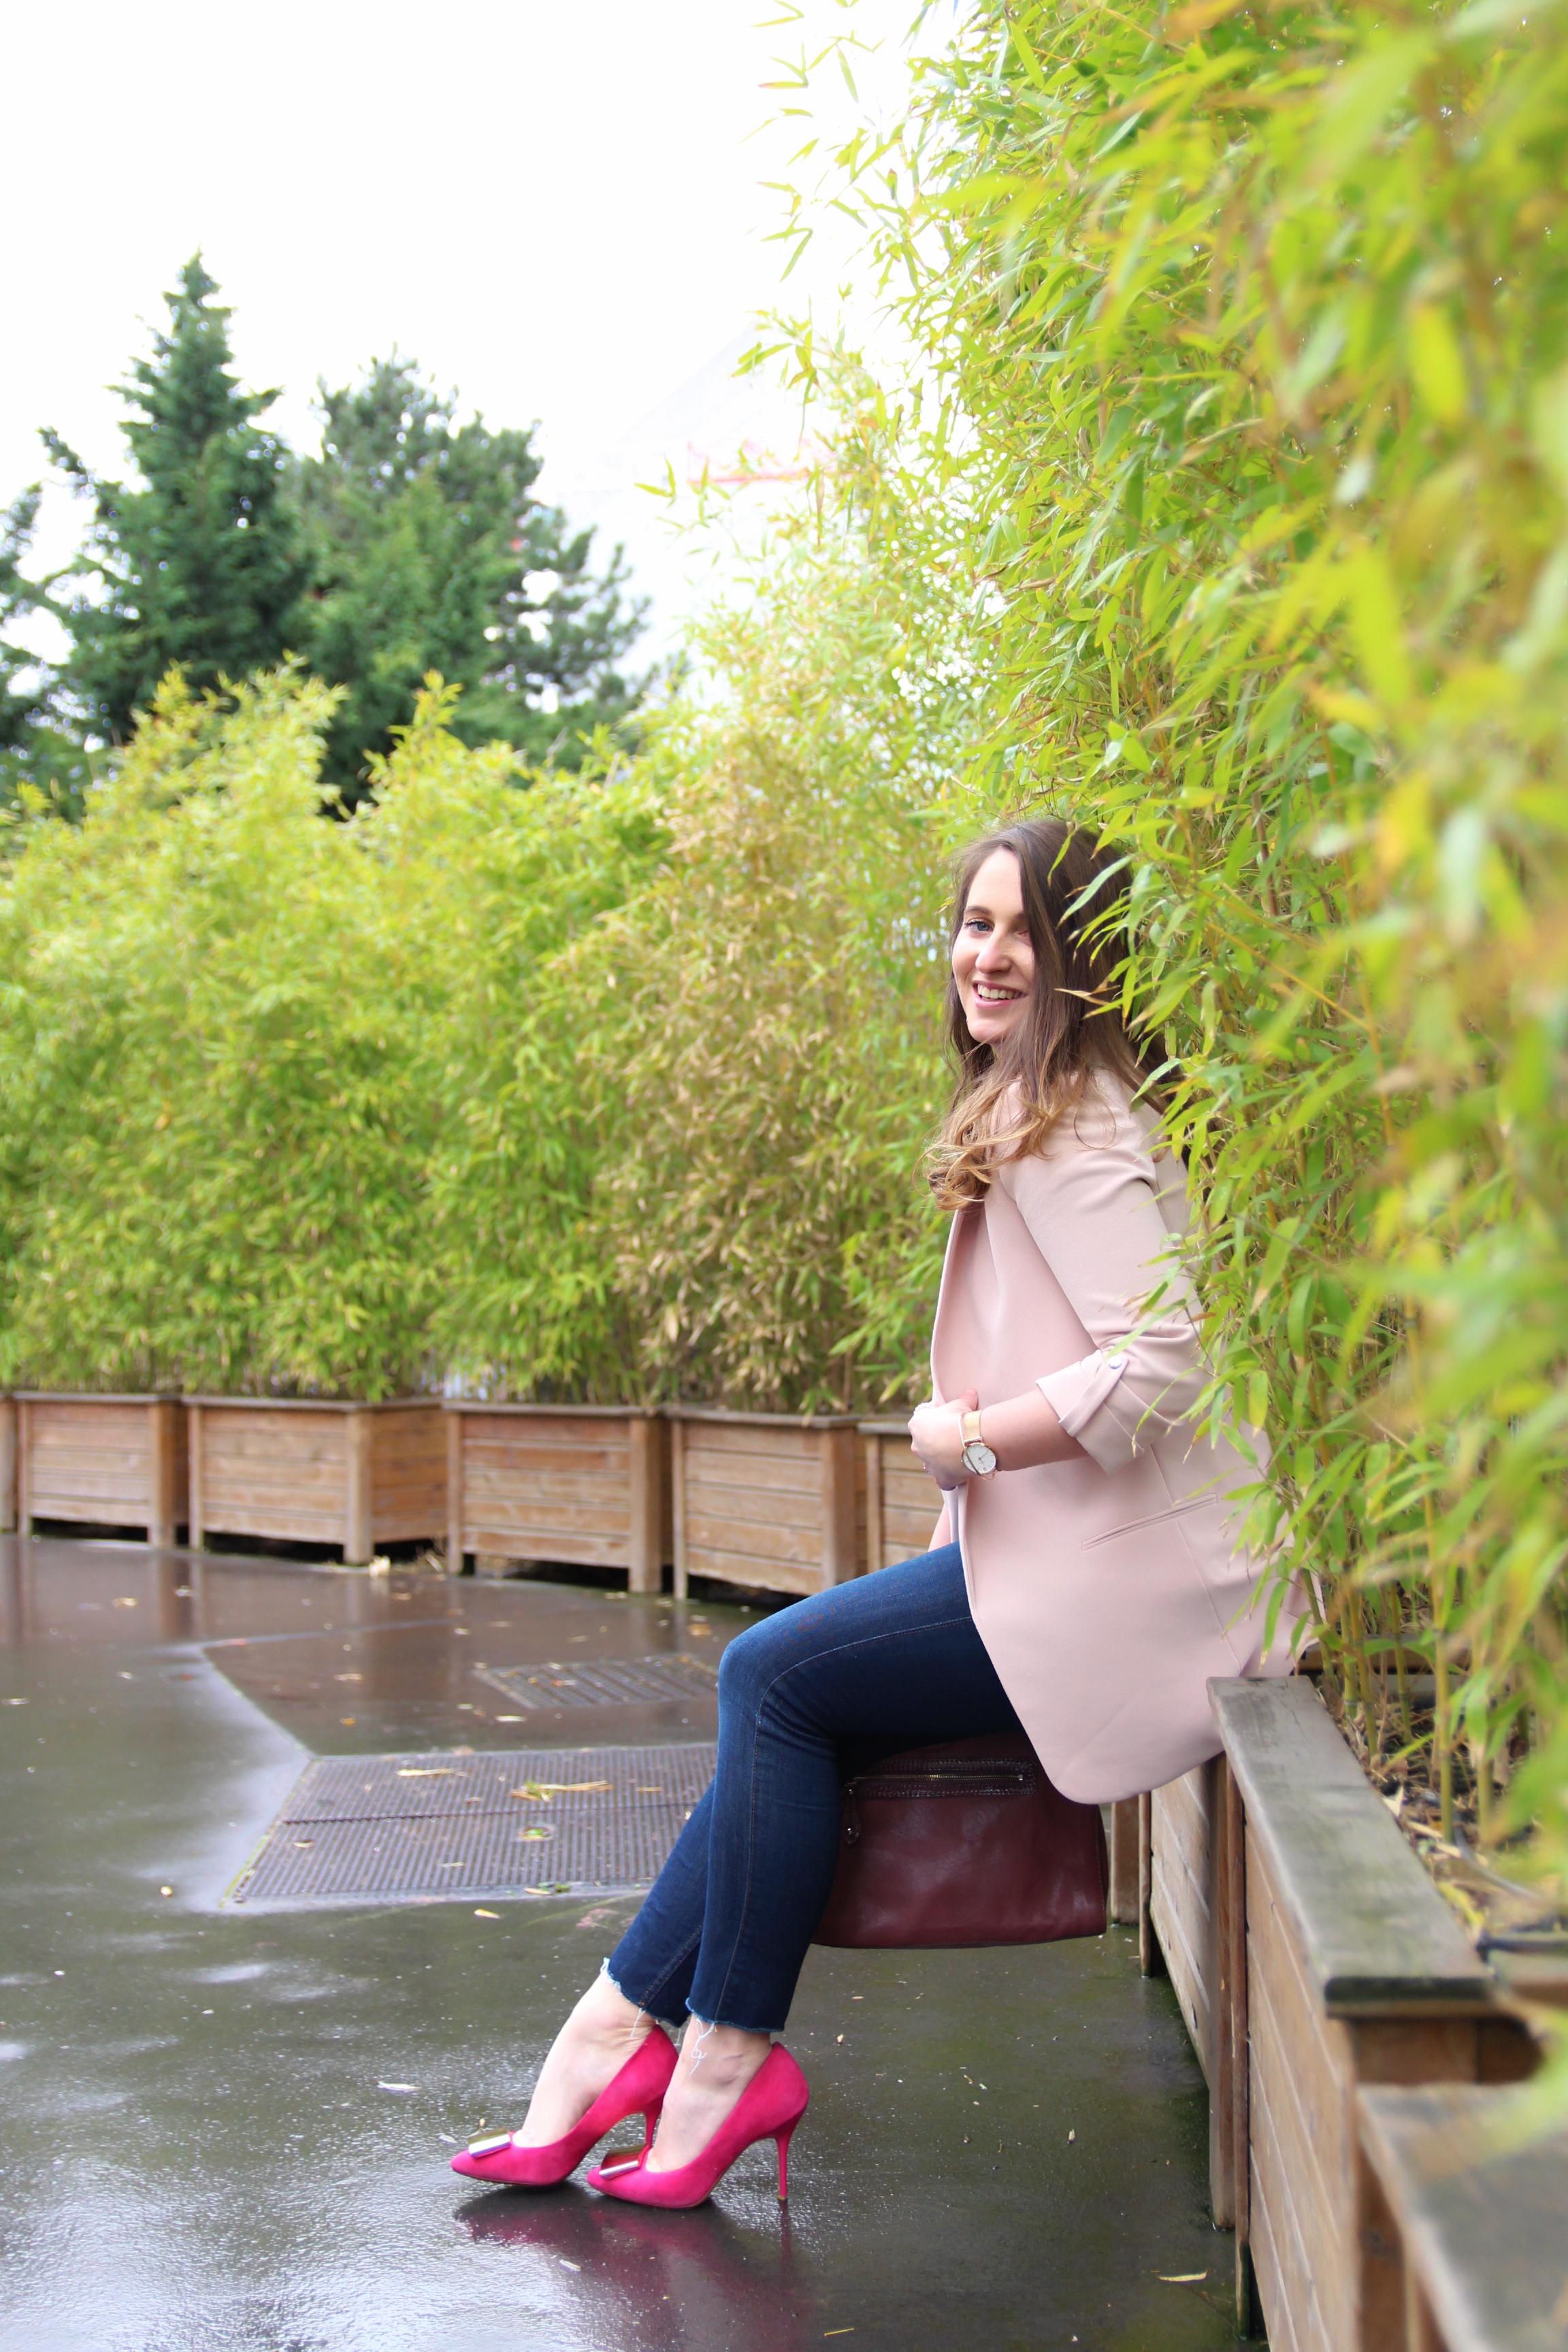 fashionblogger-influencer-jacket-zara-rosepastel-paris-seralynepointcom-114707